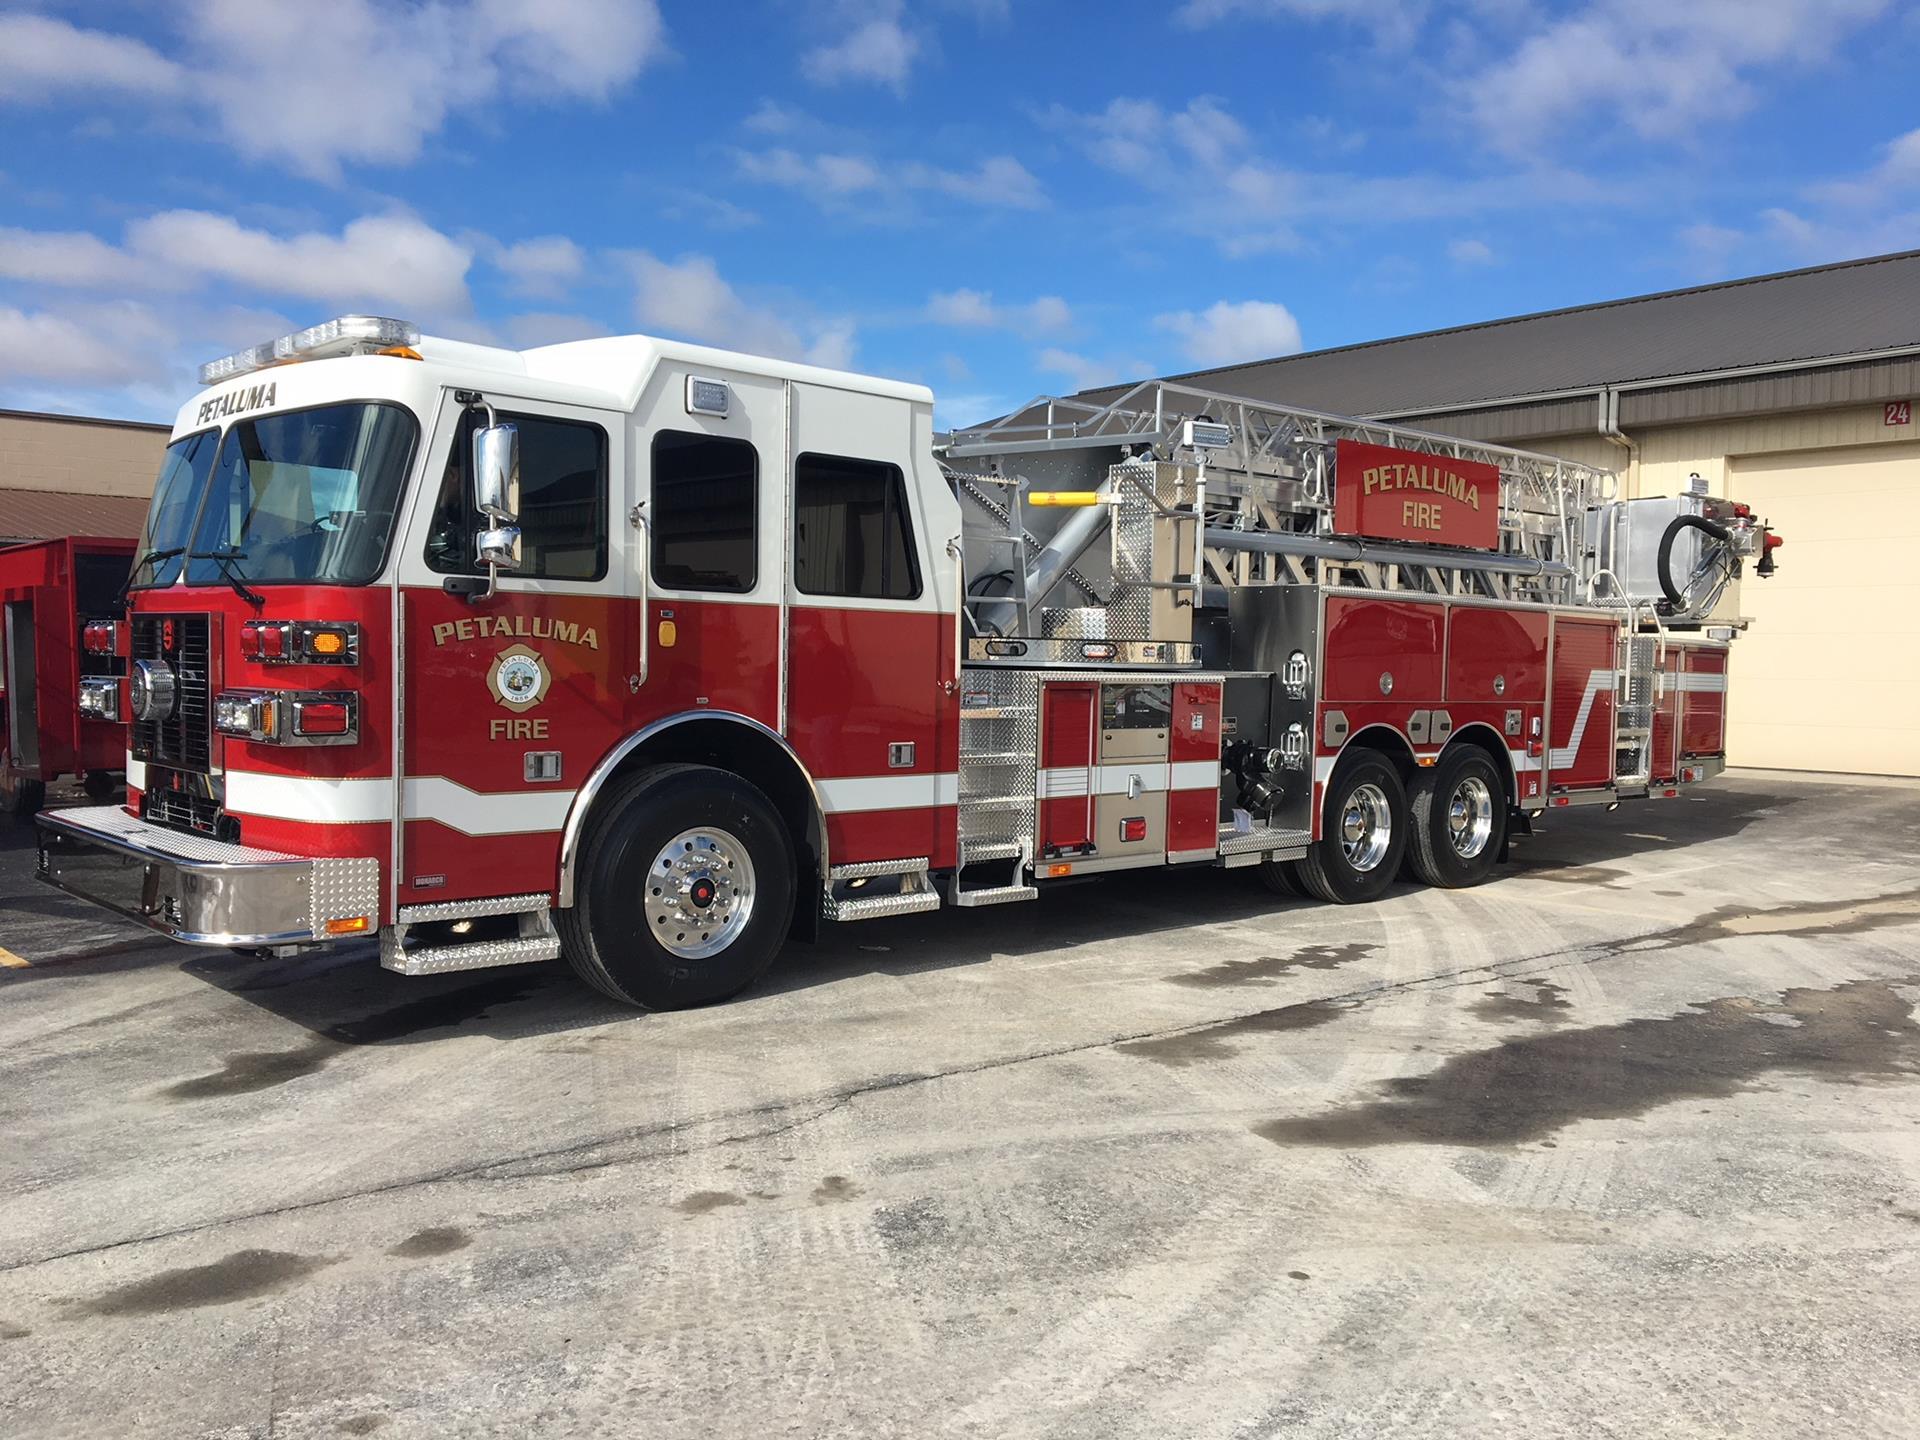 Petaluma Fire Department